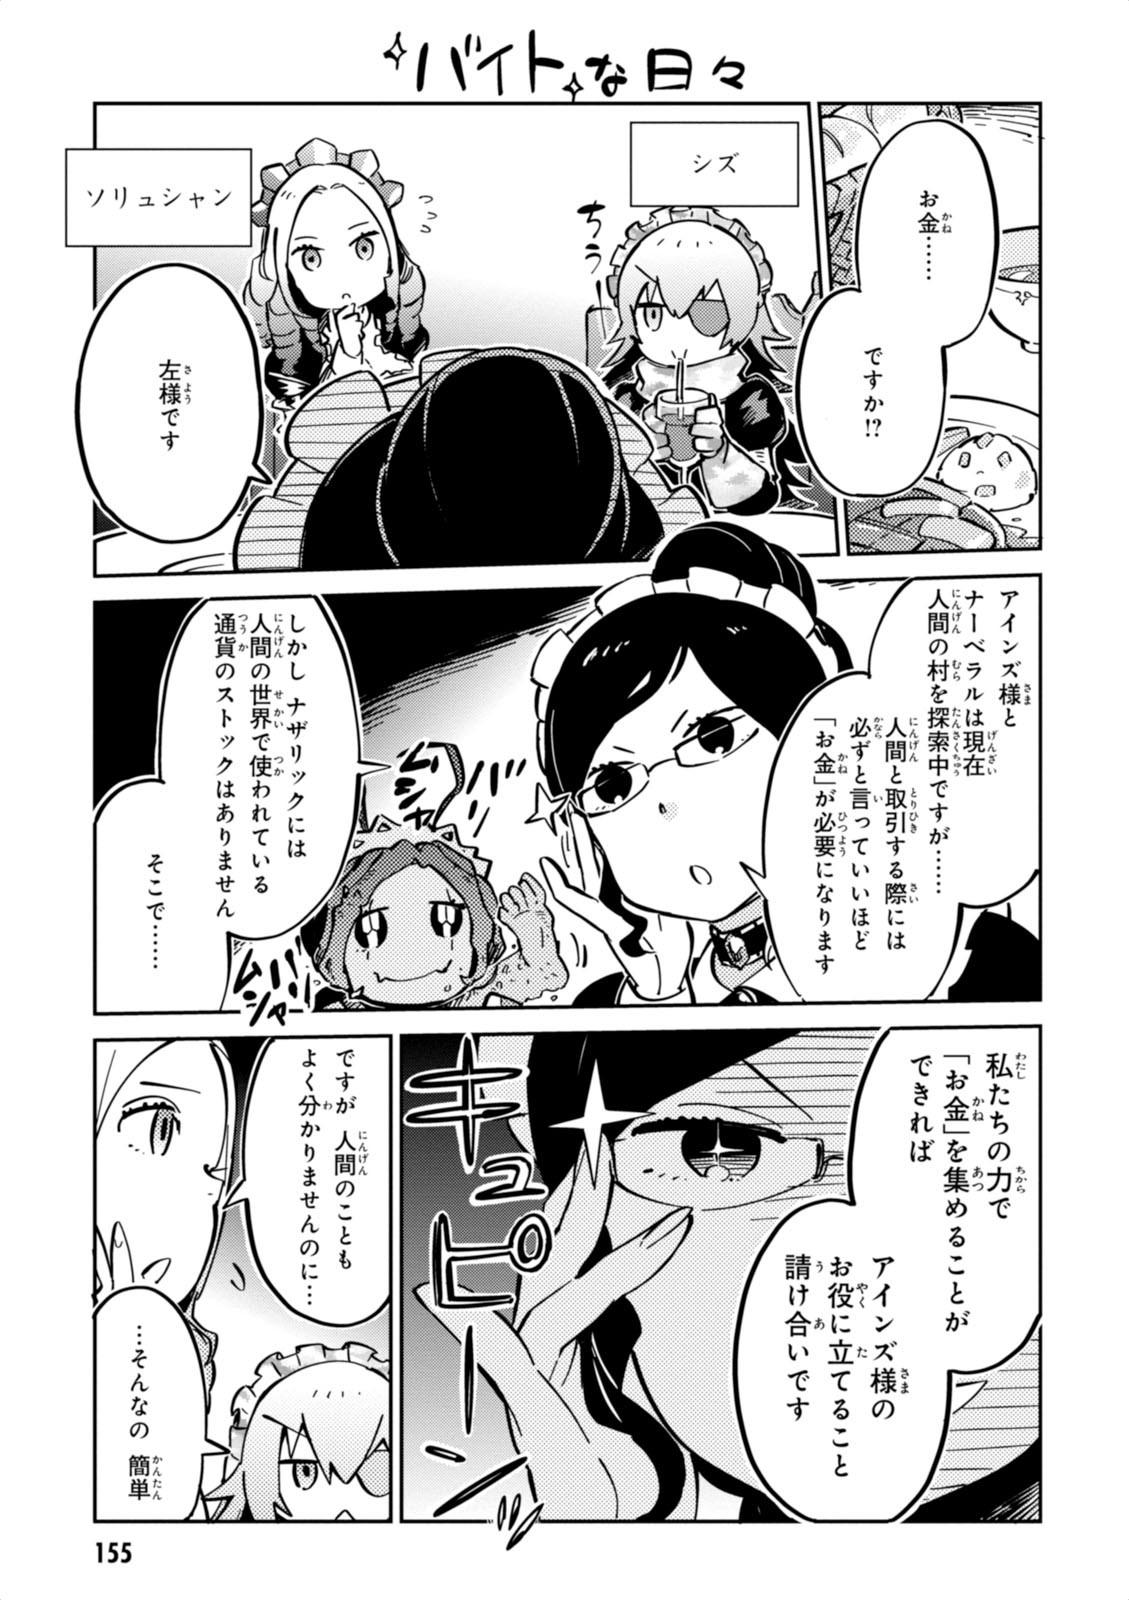 Overlord Blu-ray 02 Manga Special